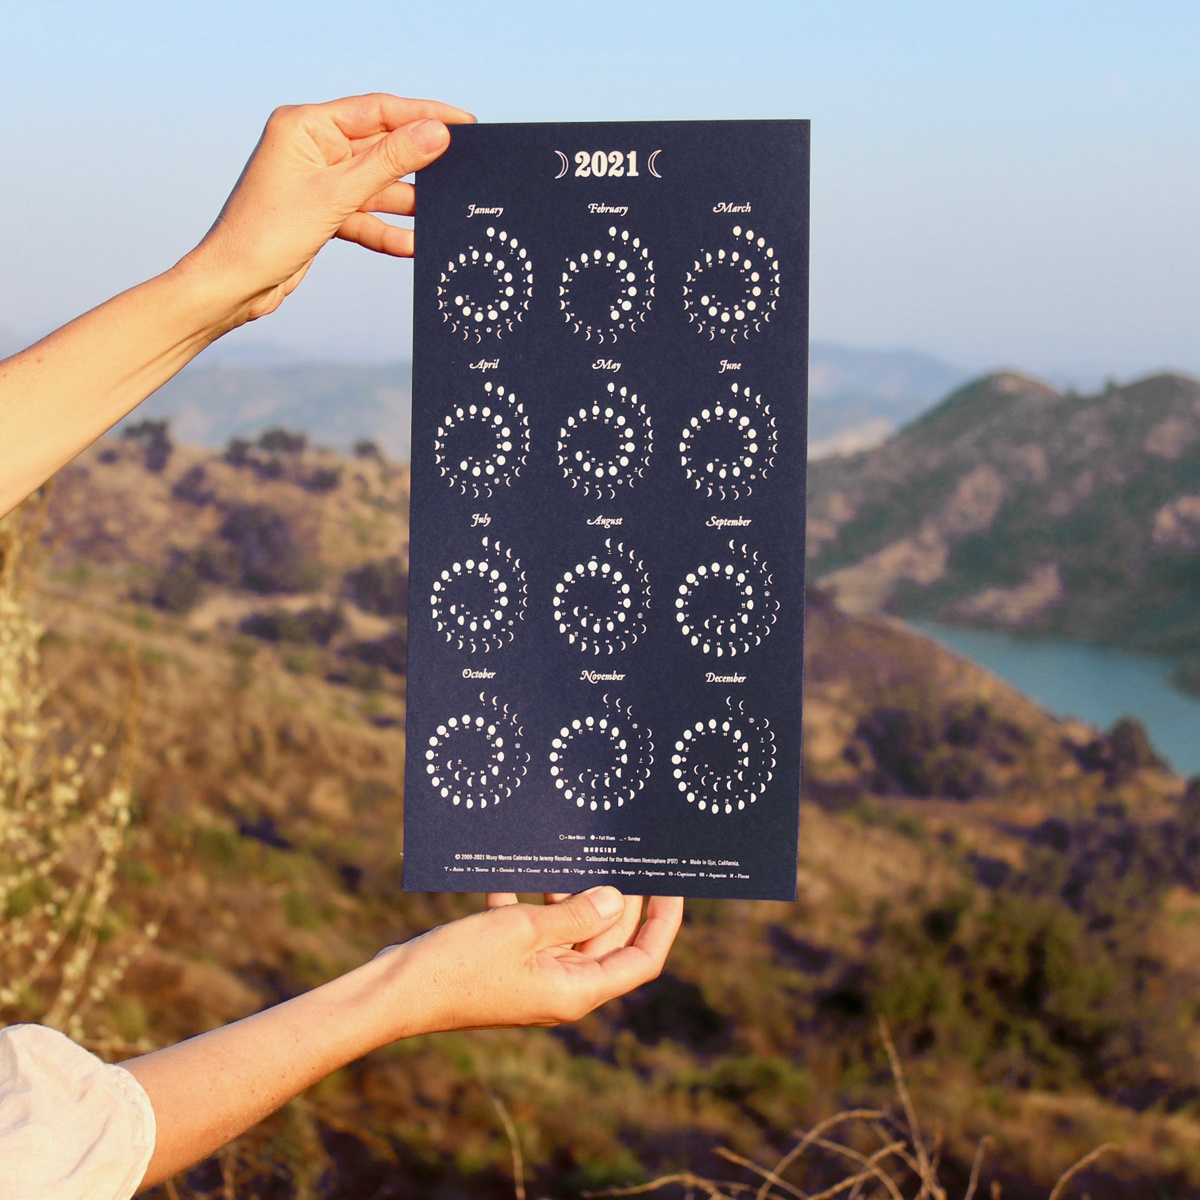 Margins Imprint 2021 Nightsky Moon phase Calendar (unframed)